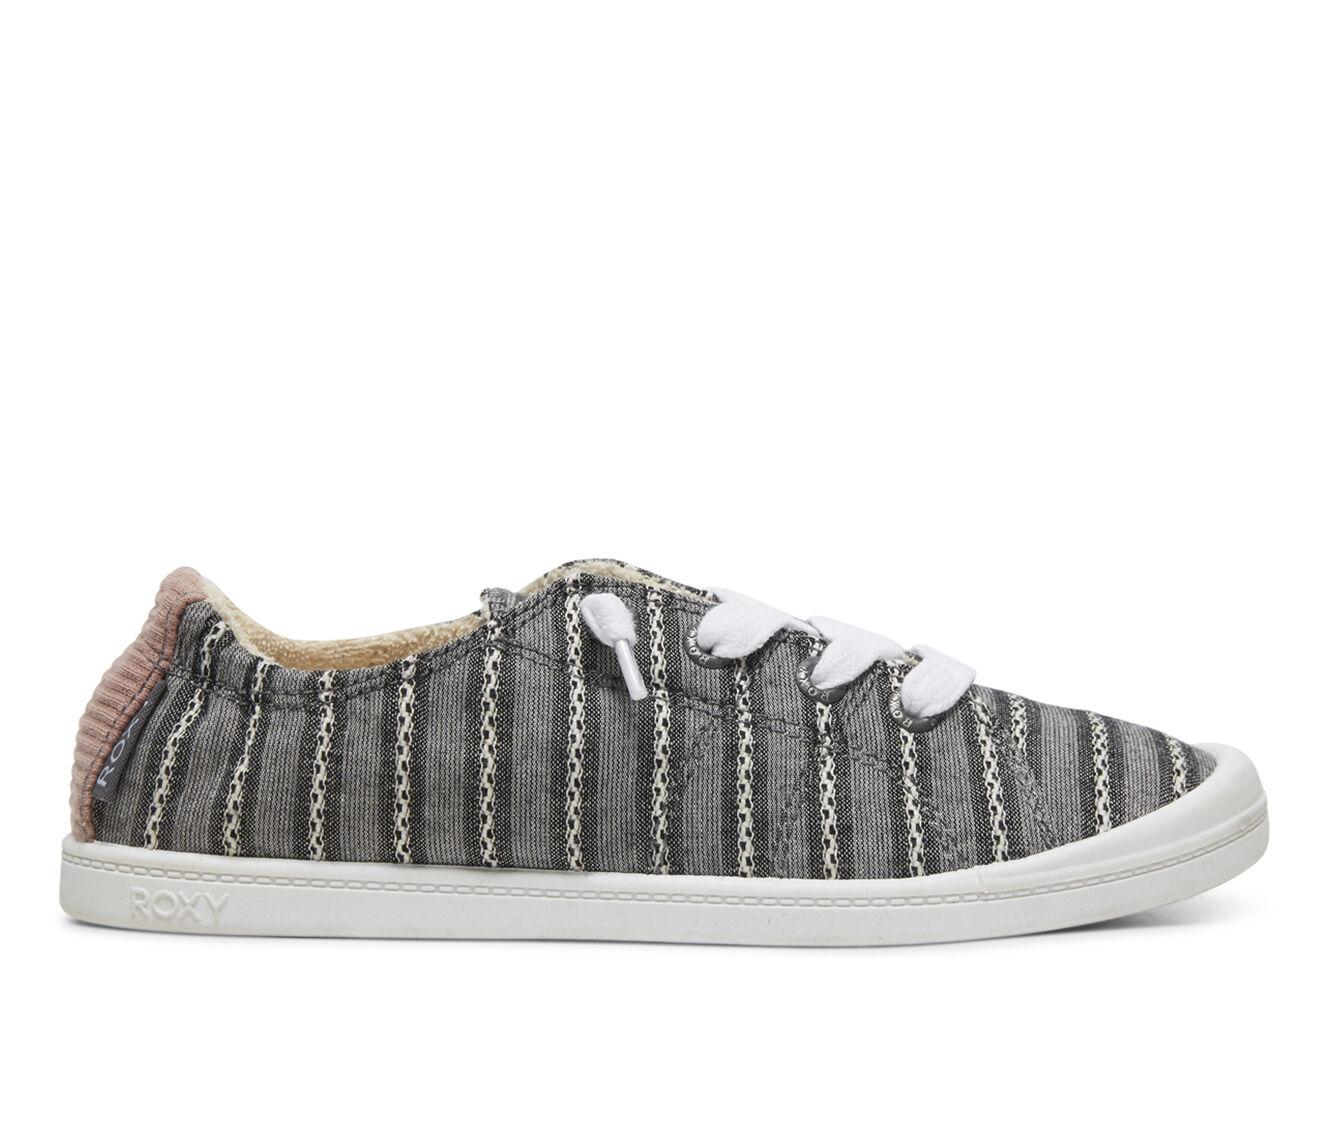 Women's Roxy Bayshore Sneakers Black Stripe